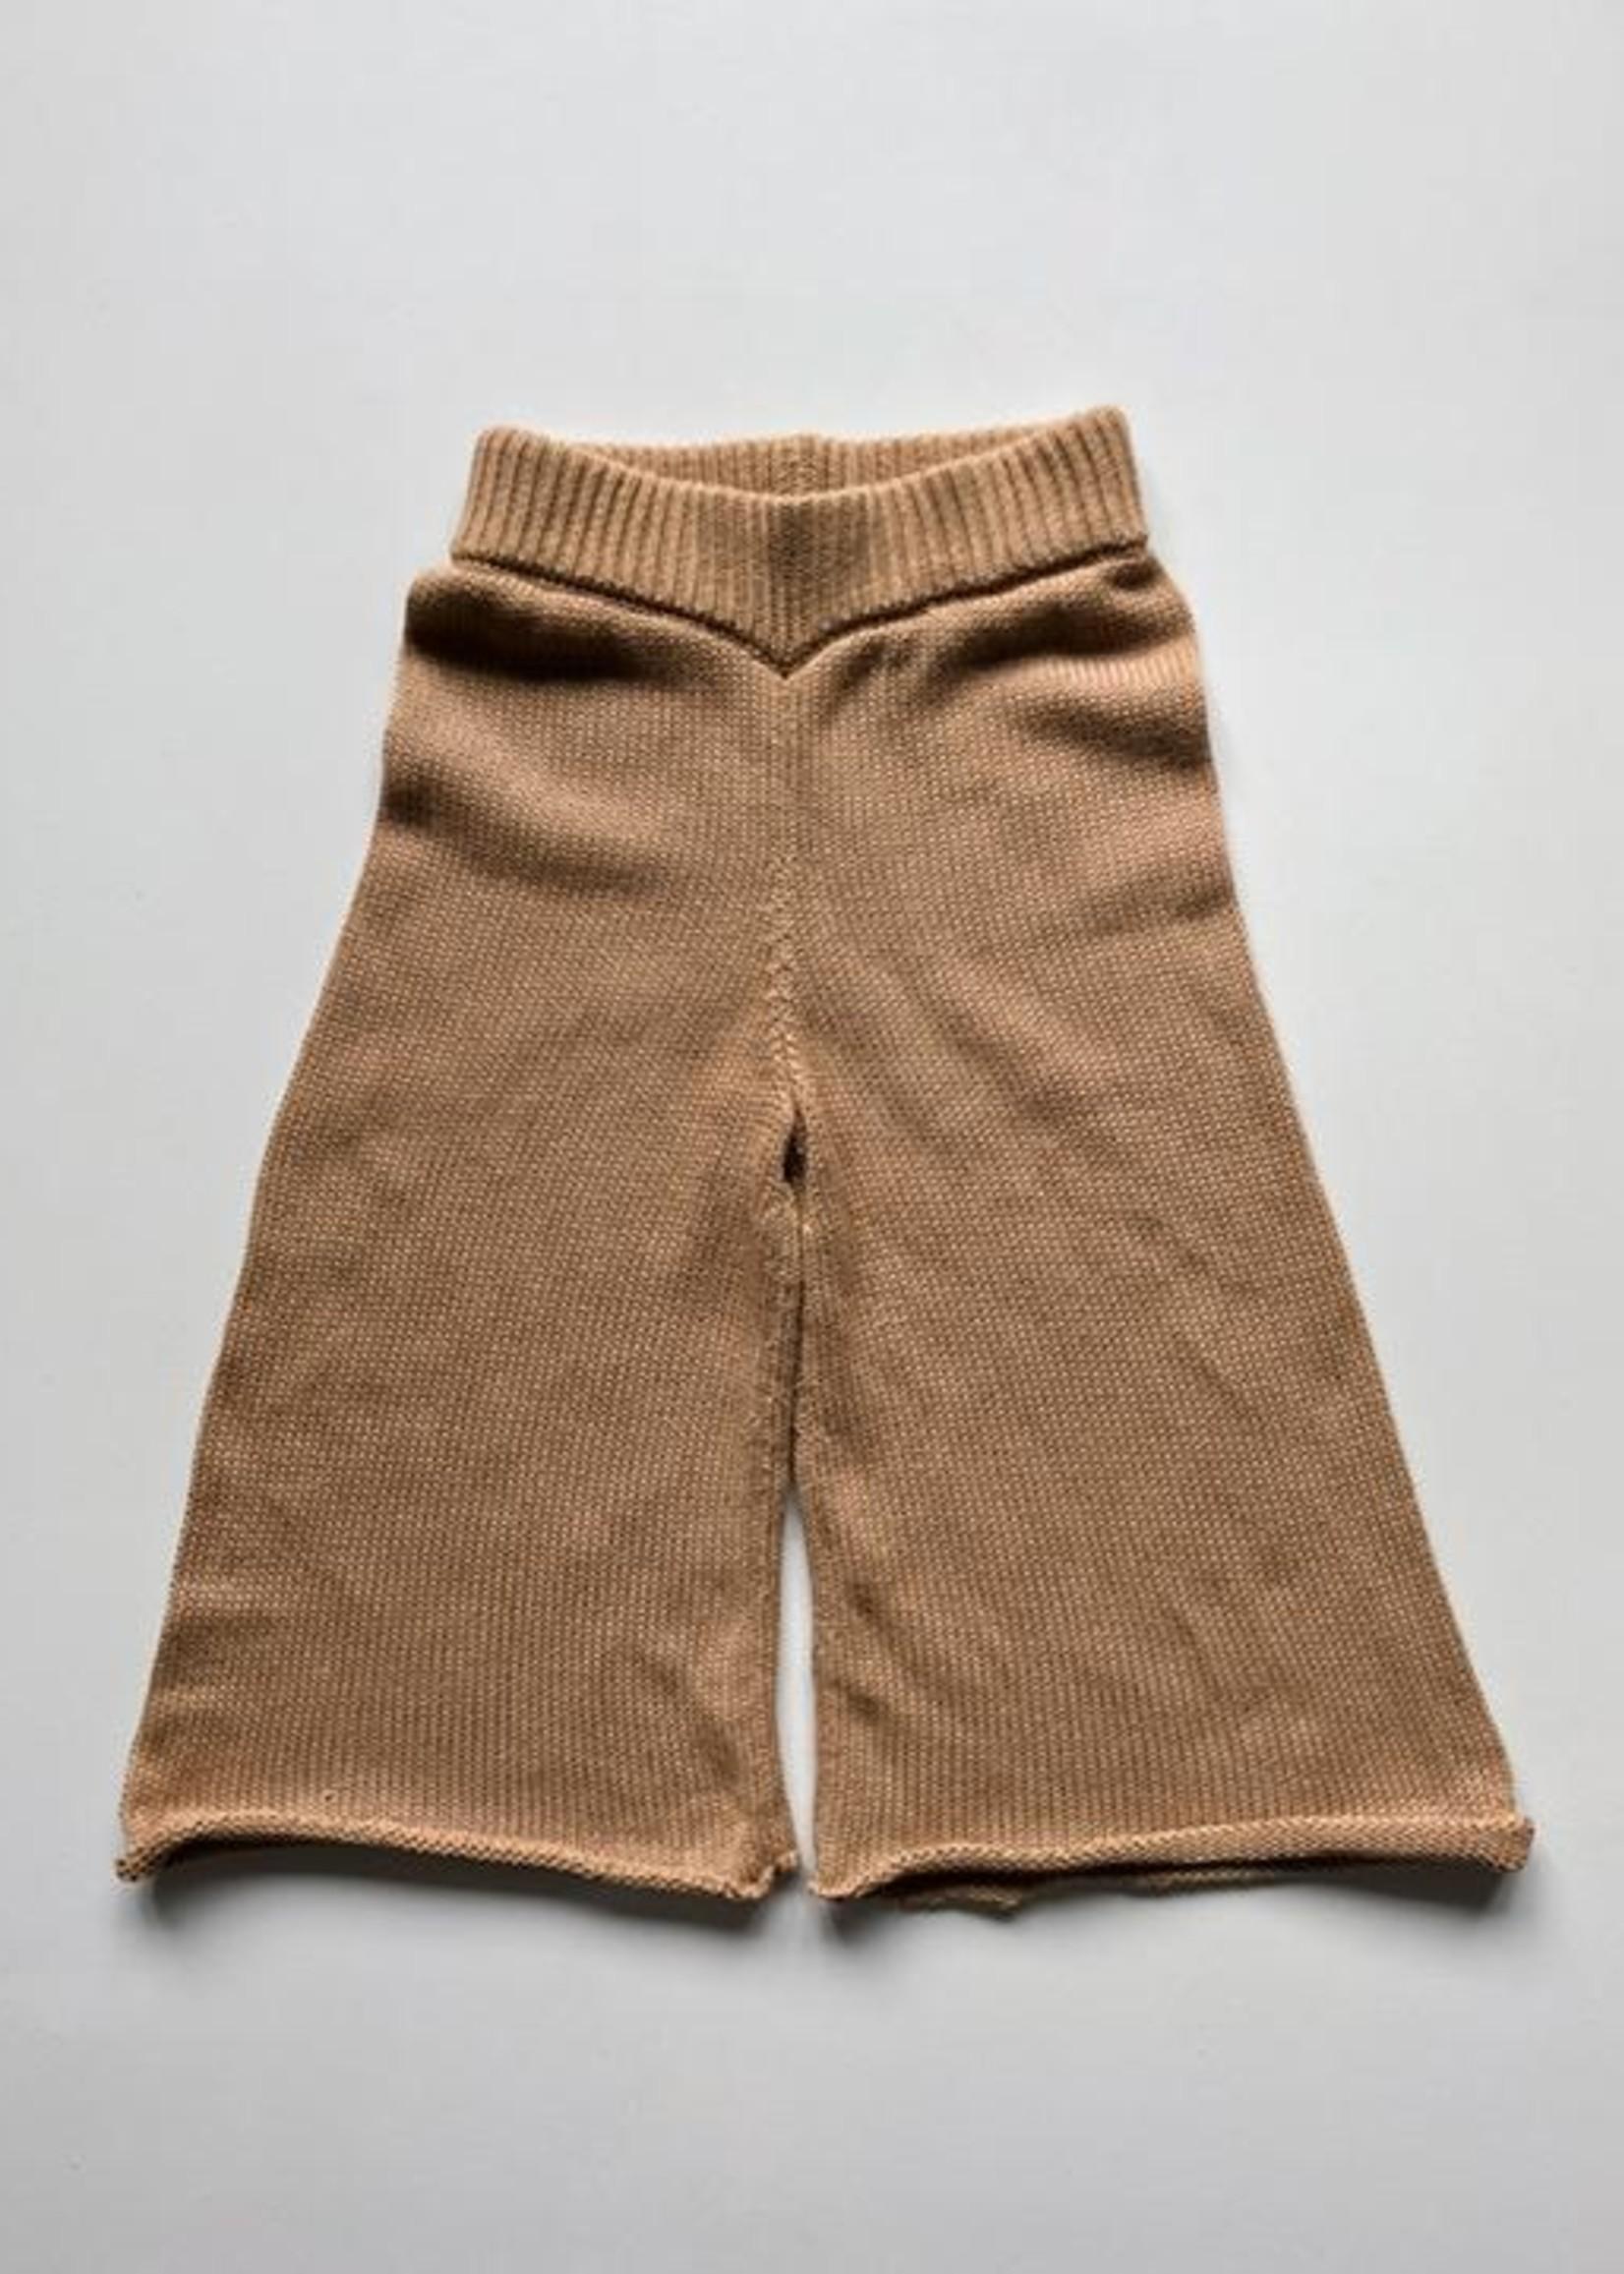 The Simple Folk Laatste Wide Leg Knit Trouser, maat 5-6 jaar